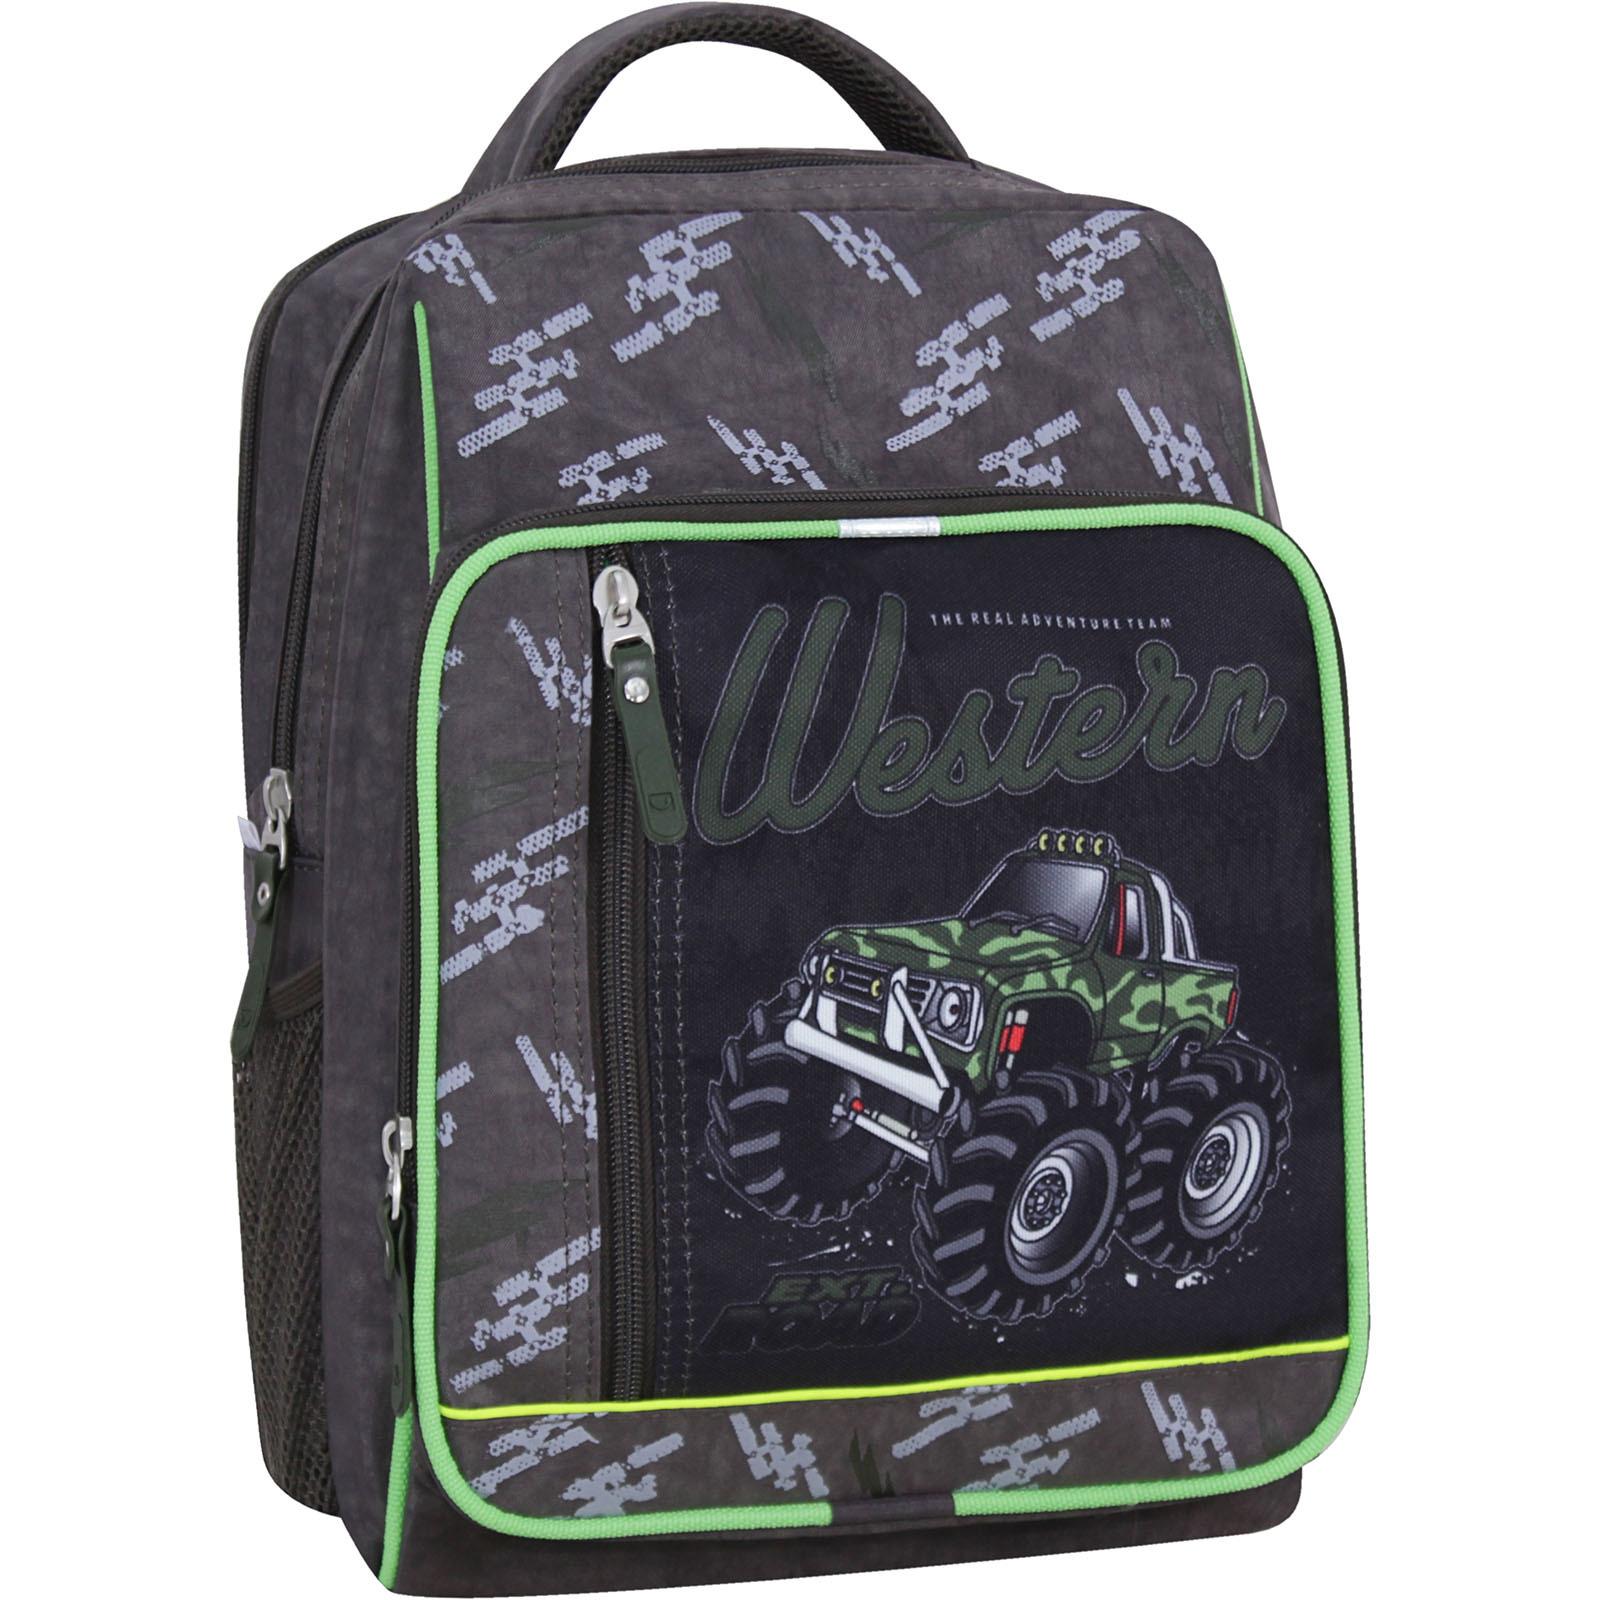 Школьные рюкзаки Рюкзак школьный Bagland Школьник 8 л. хаки 664 (0012870) IMG_2621_суб_664_-1600.jpg